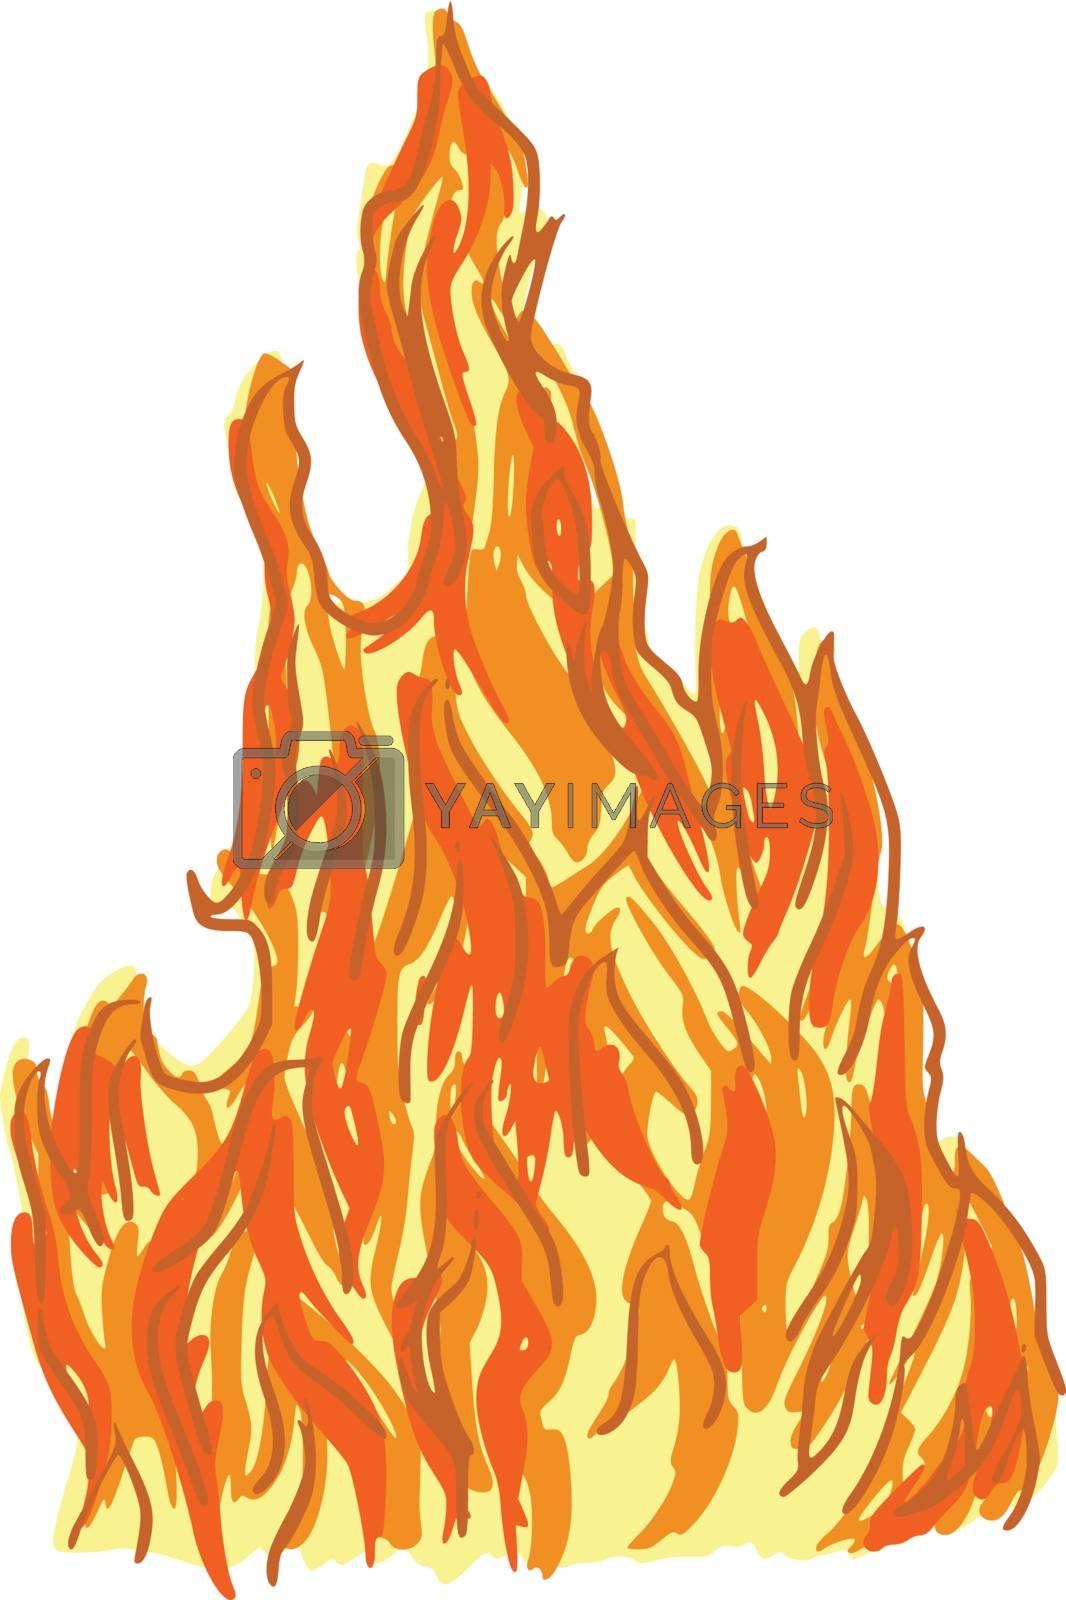 hand drawn, cartoon, sketch illustration of fire